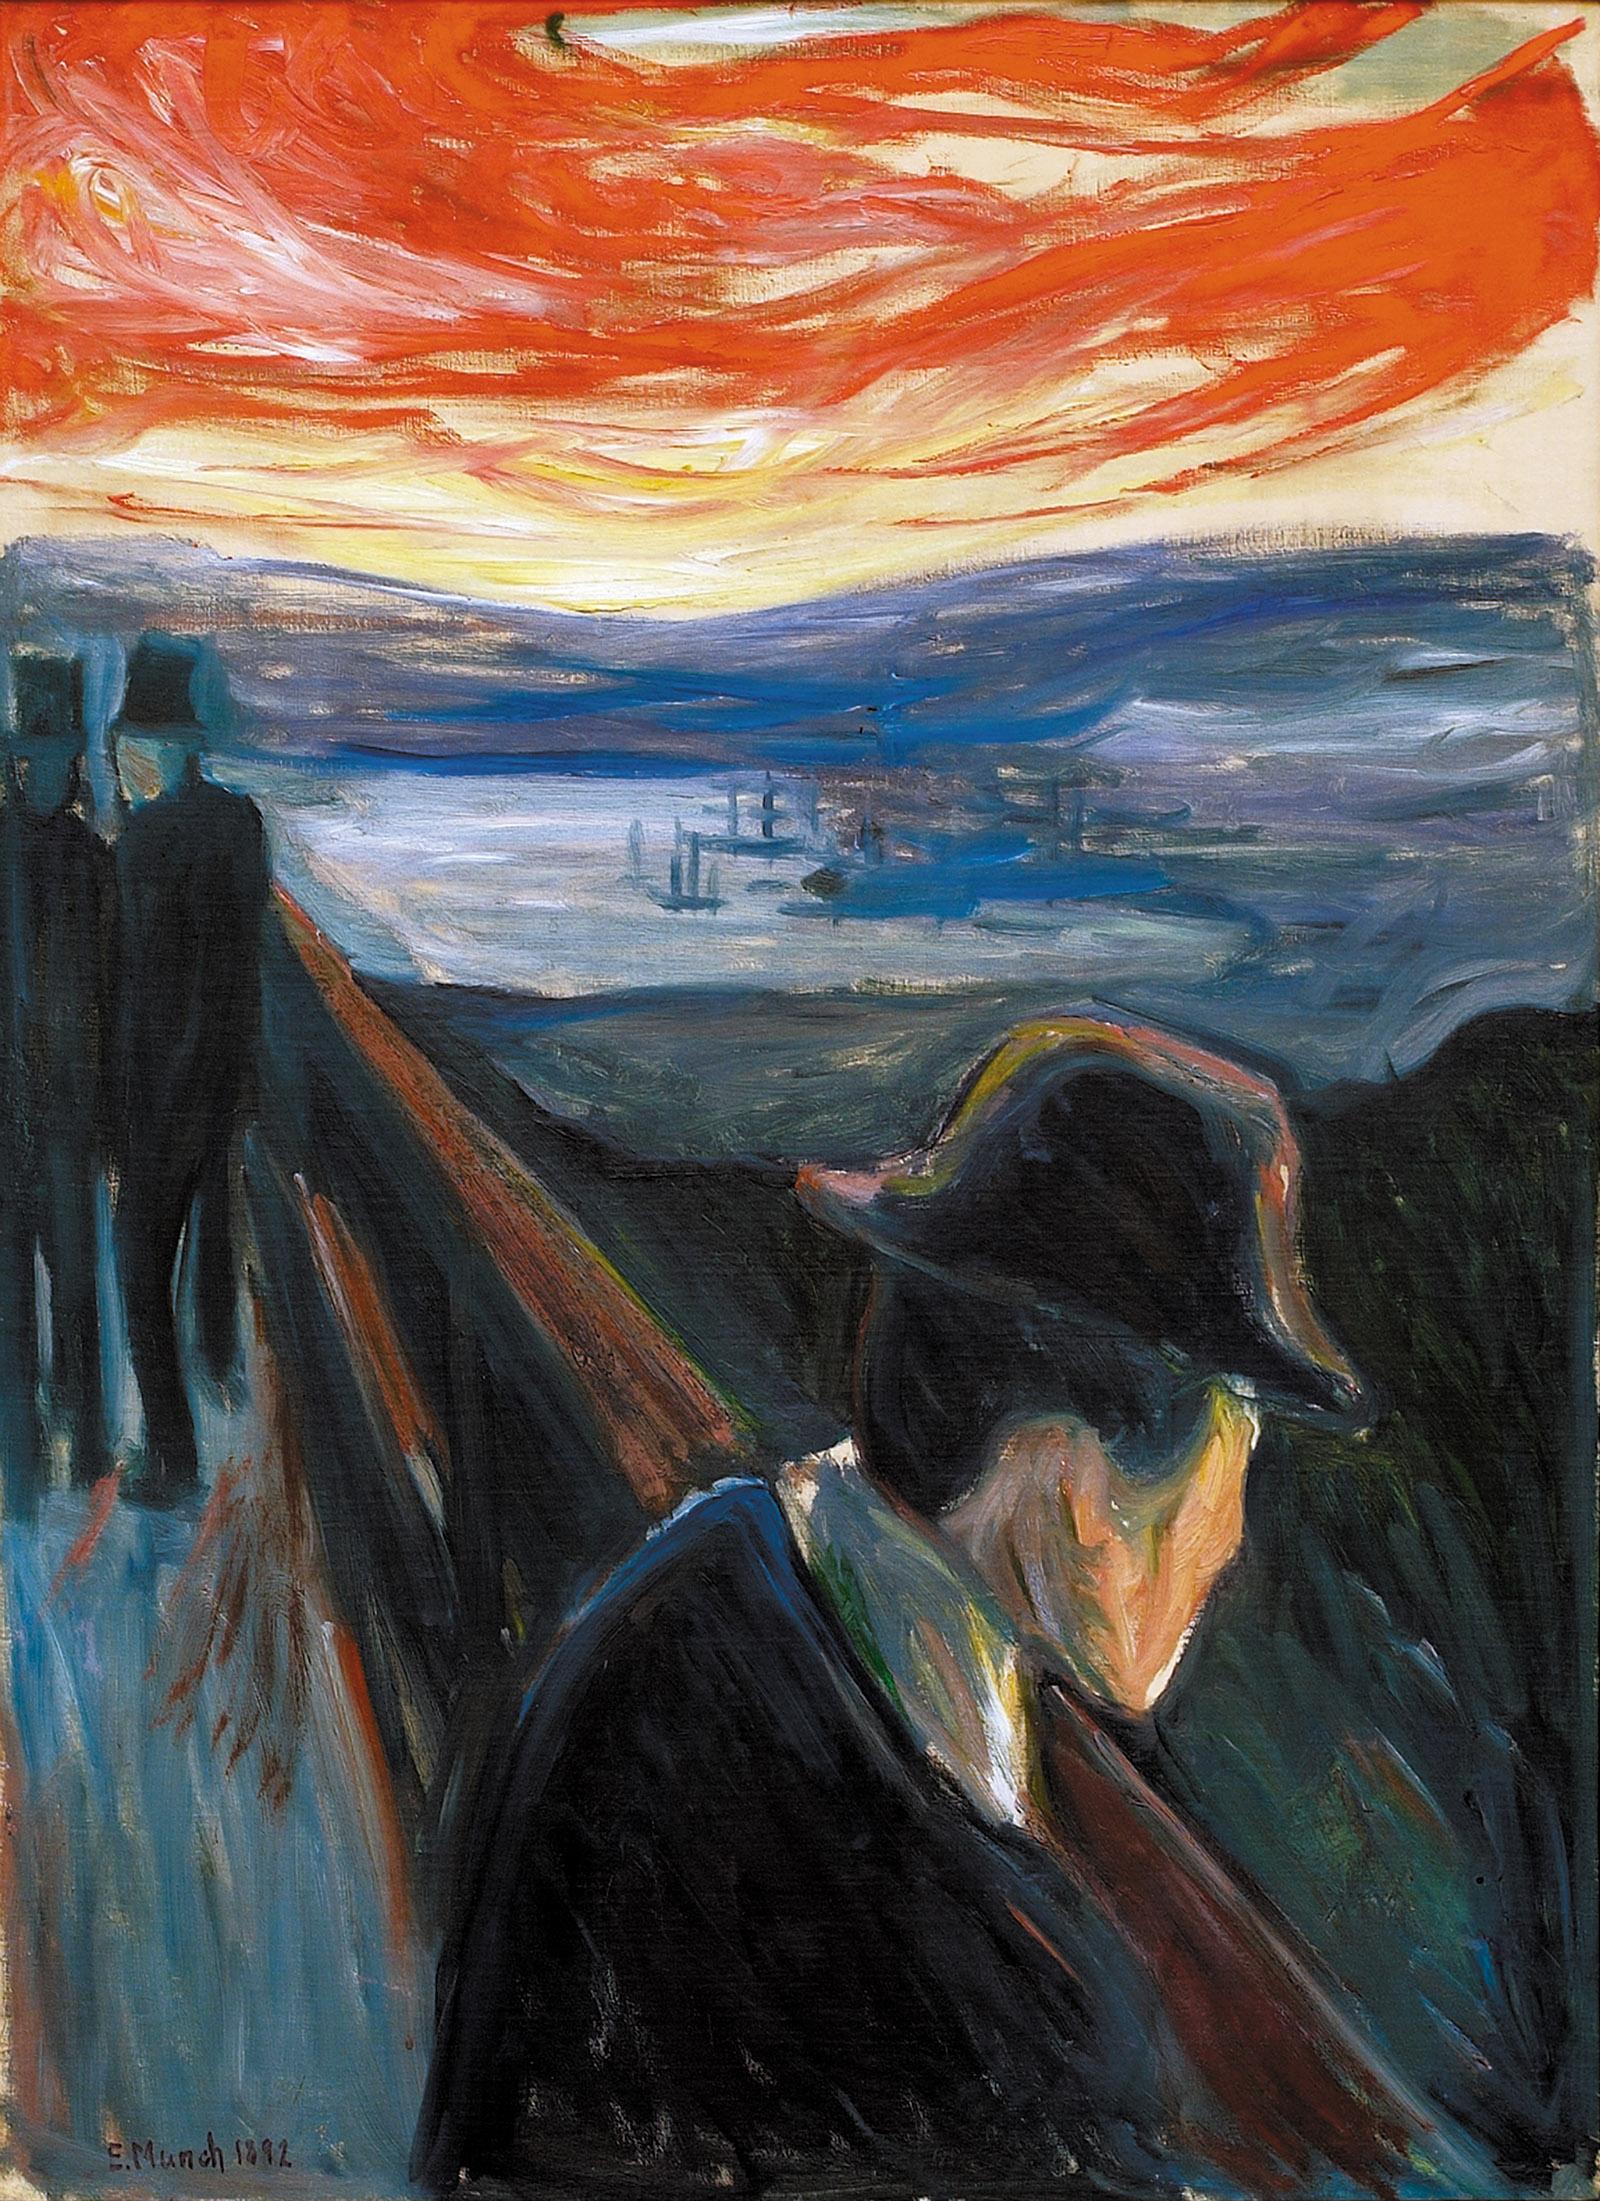 Edvard Munch: Sick Mood at Sunset: Despair, 1892